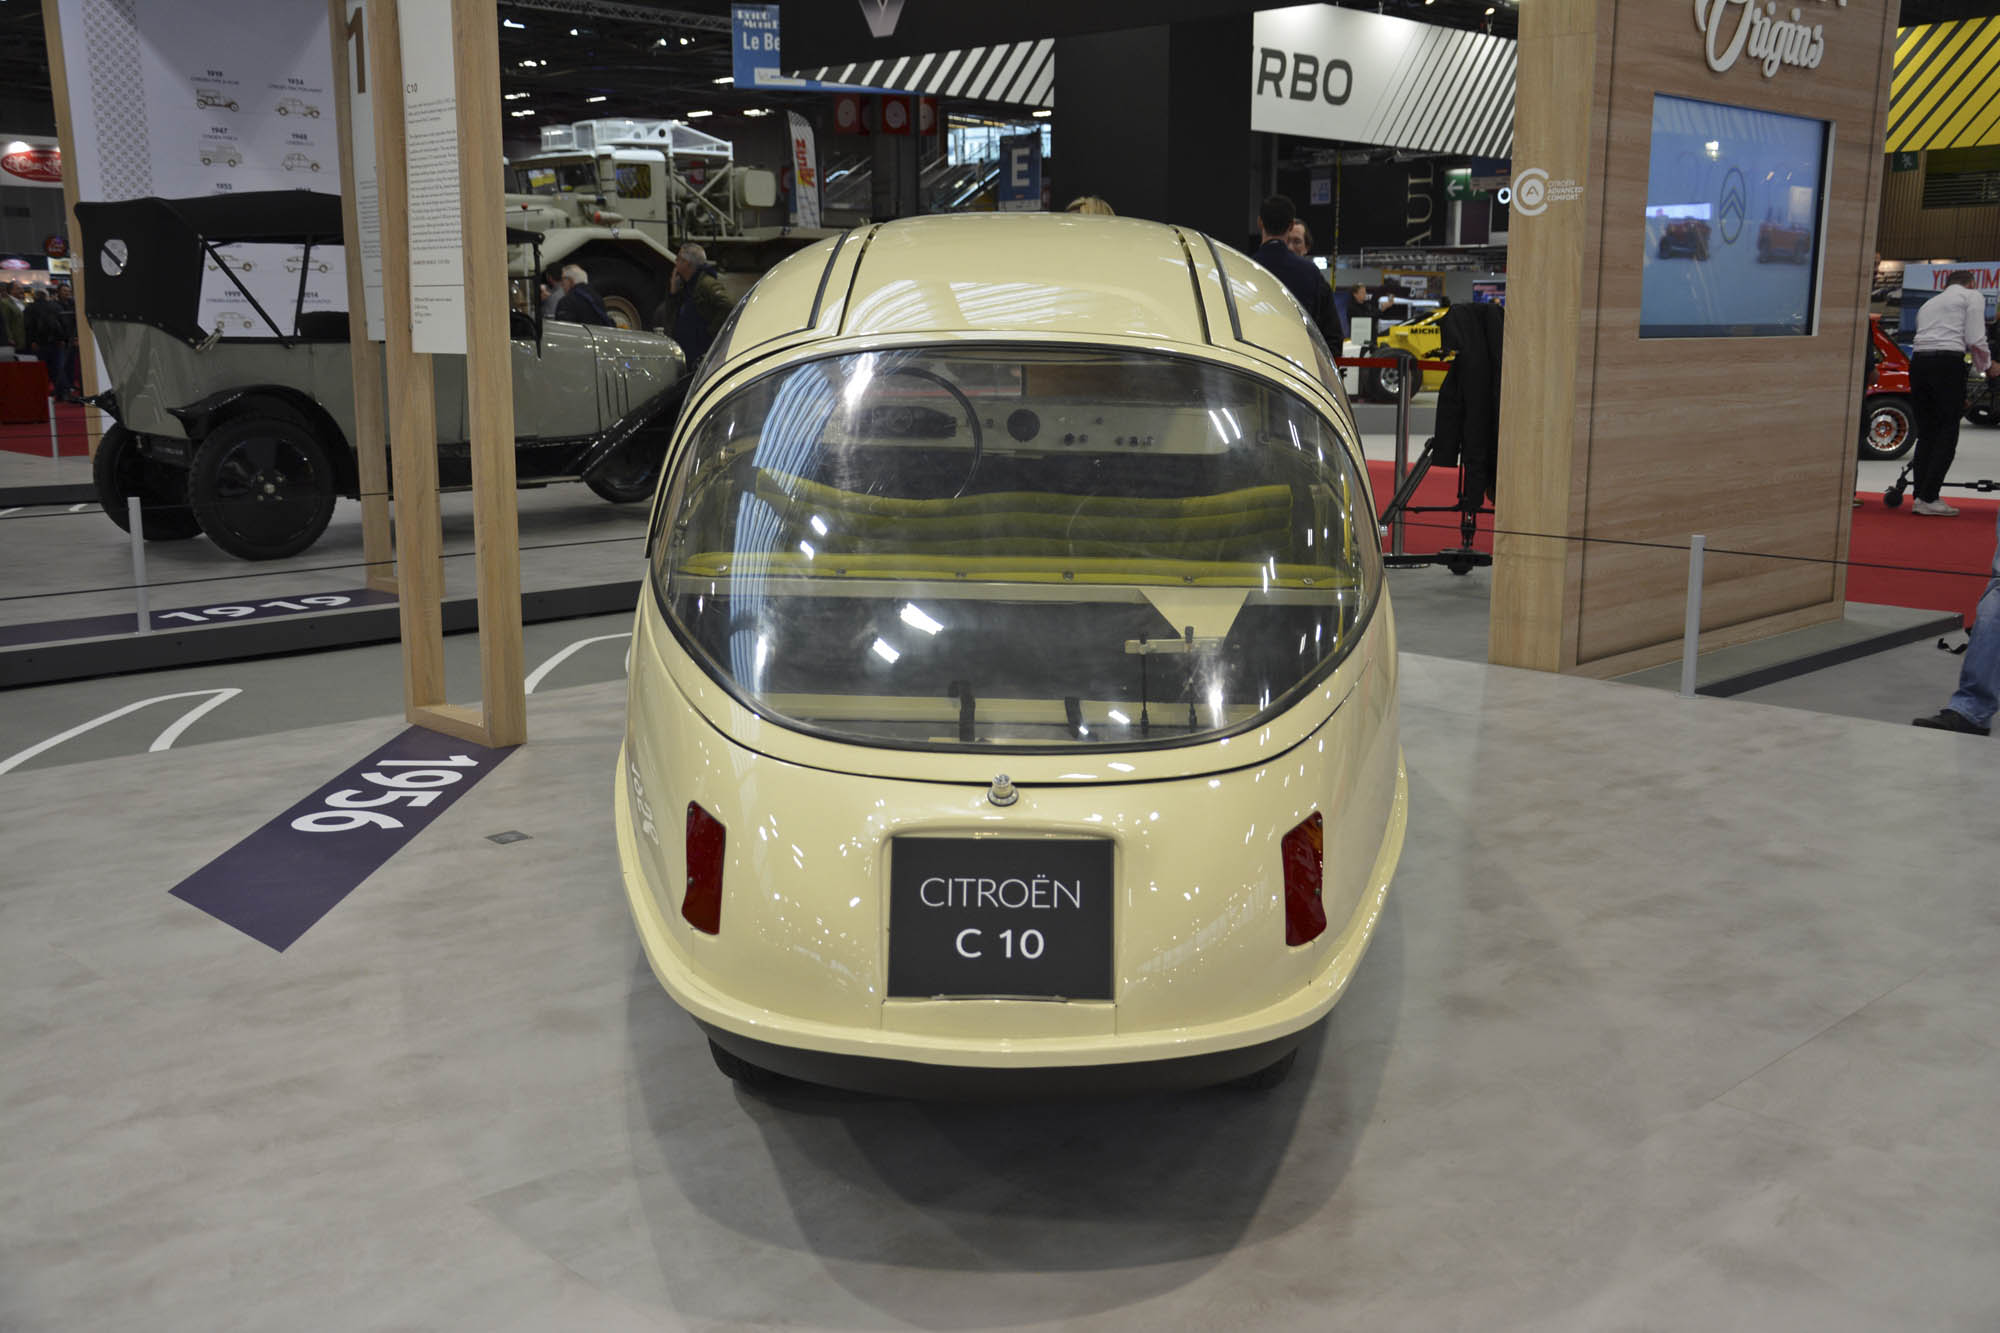 Citroën C10 rear